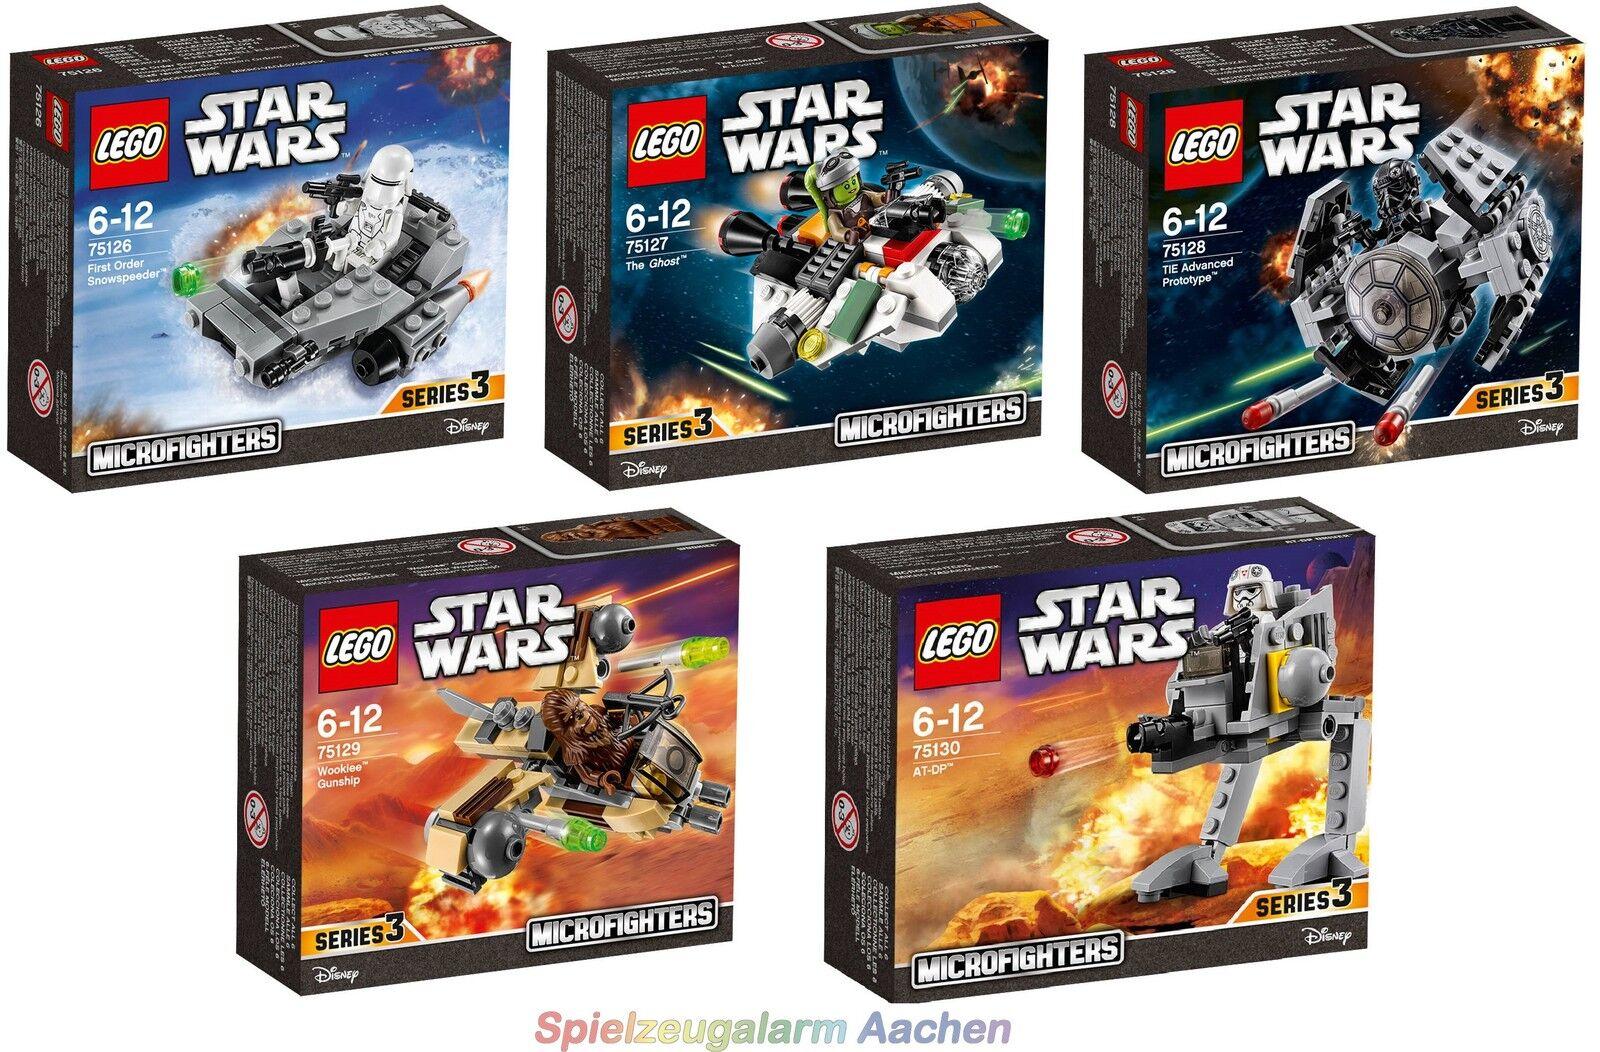 Lego Star Wars Super set 75126 75127 75128 75129 75130 n1 16